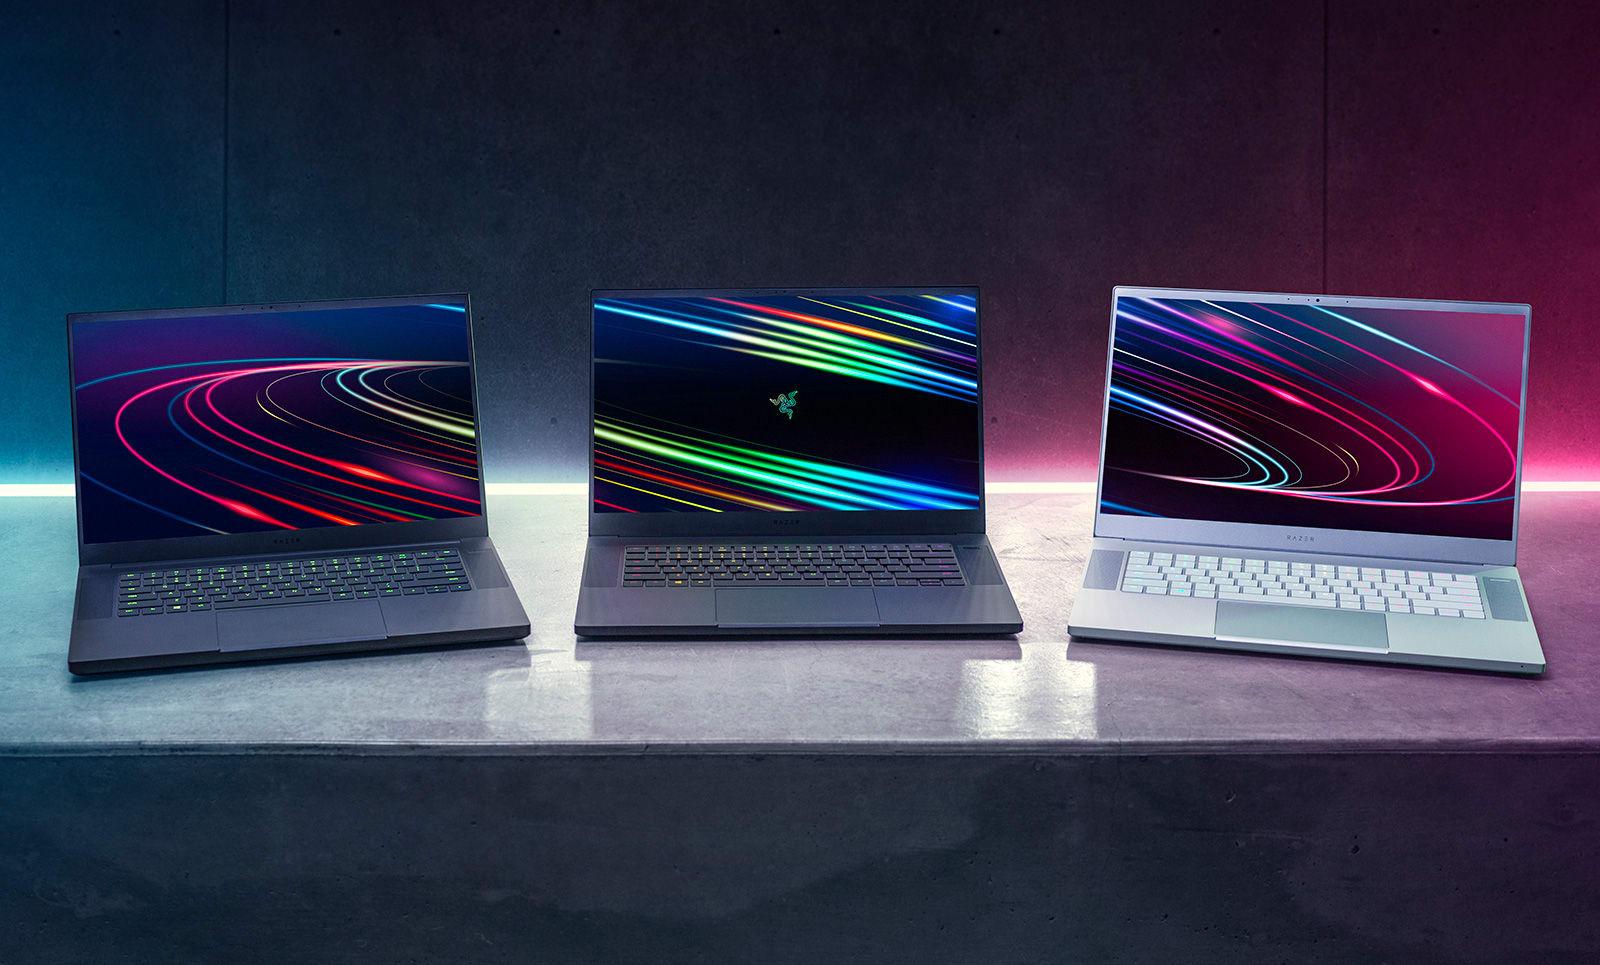 Razer Blade 15 Studio laptops